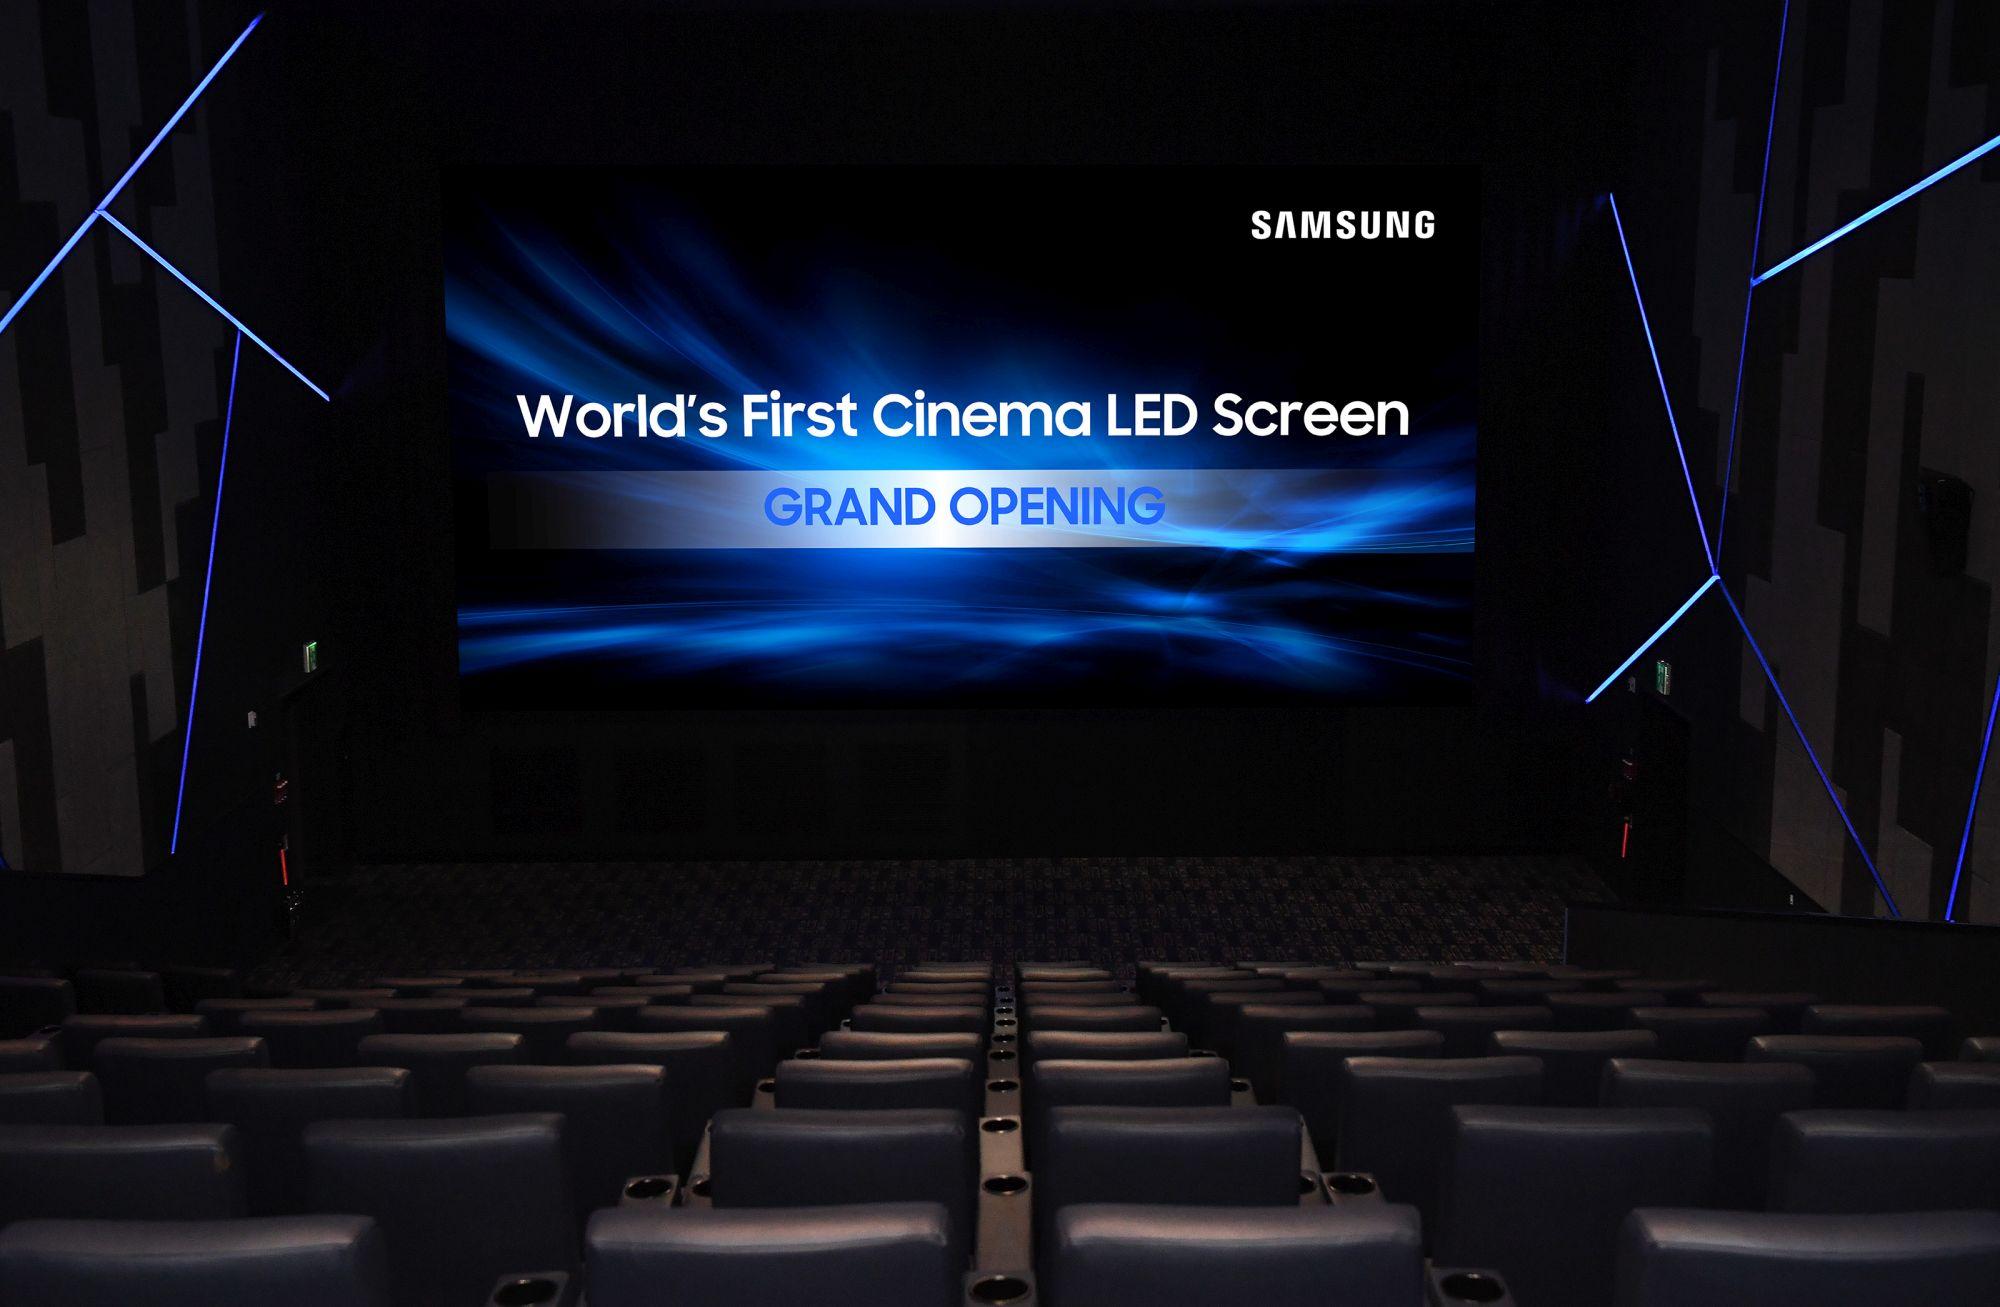 Cinema-LED-Screen-Photo-for-Global-Press-Release-2